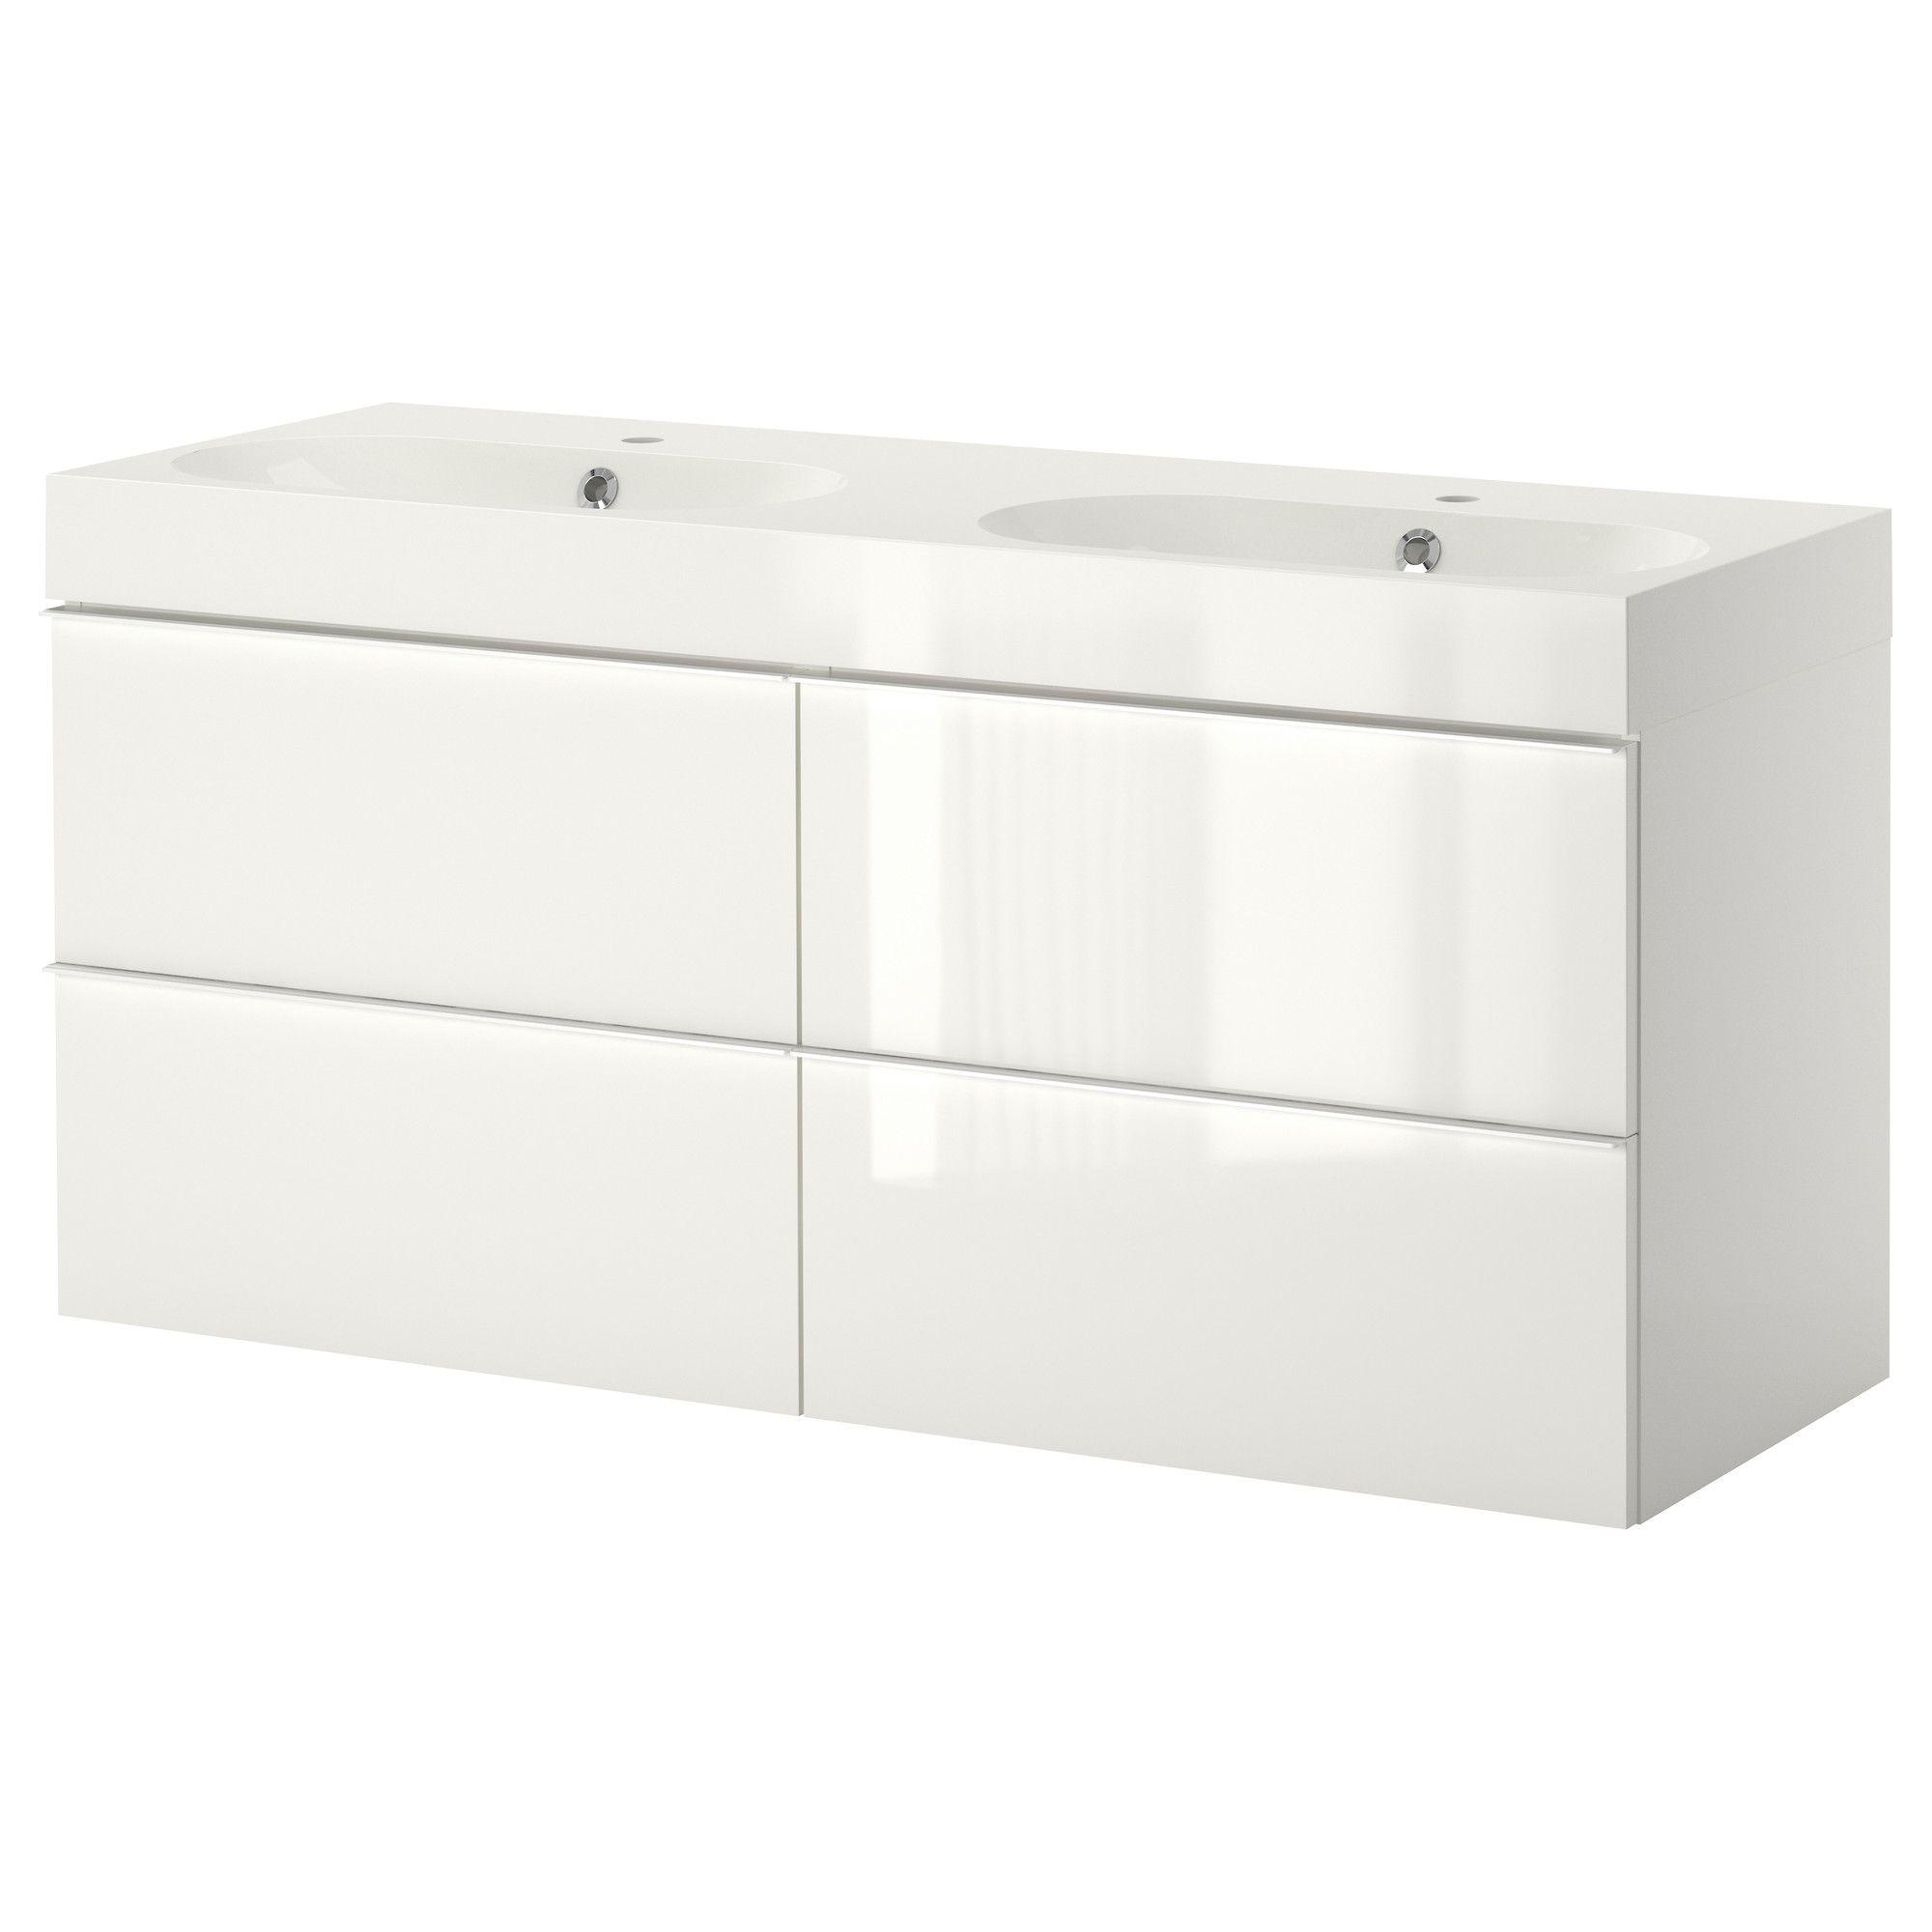 GODMORGONBRVIKEN Sink cabinet with 4 drawers high gloss white